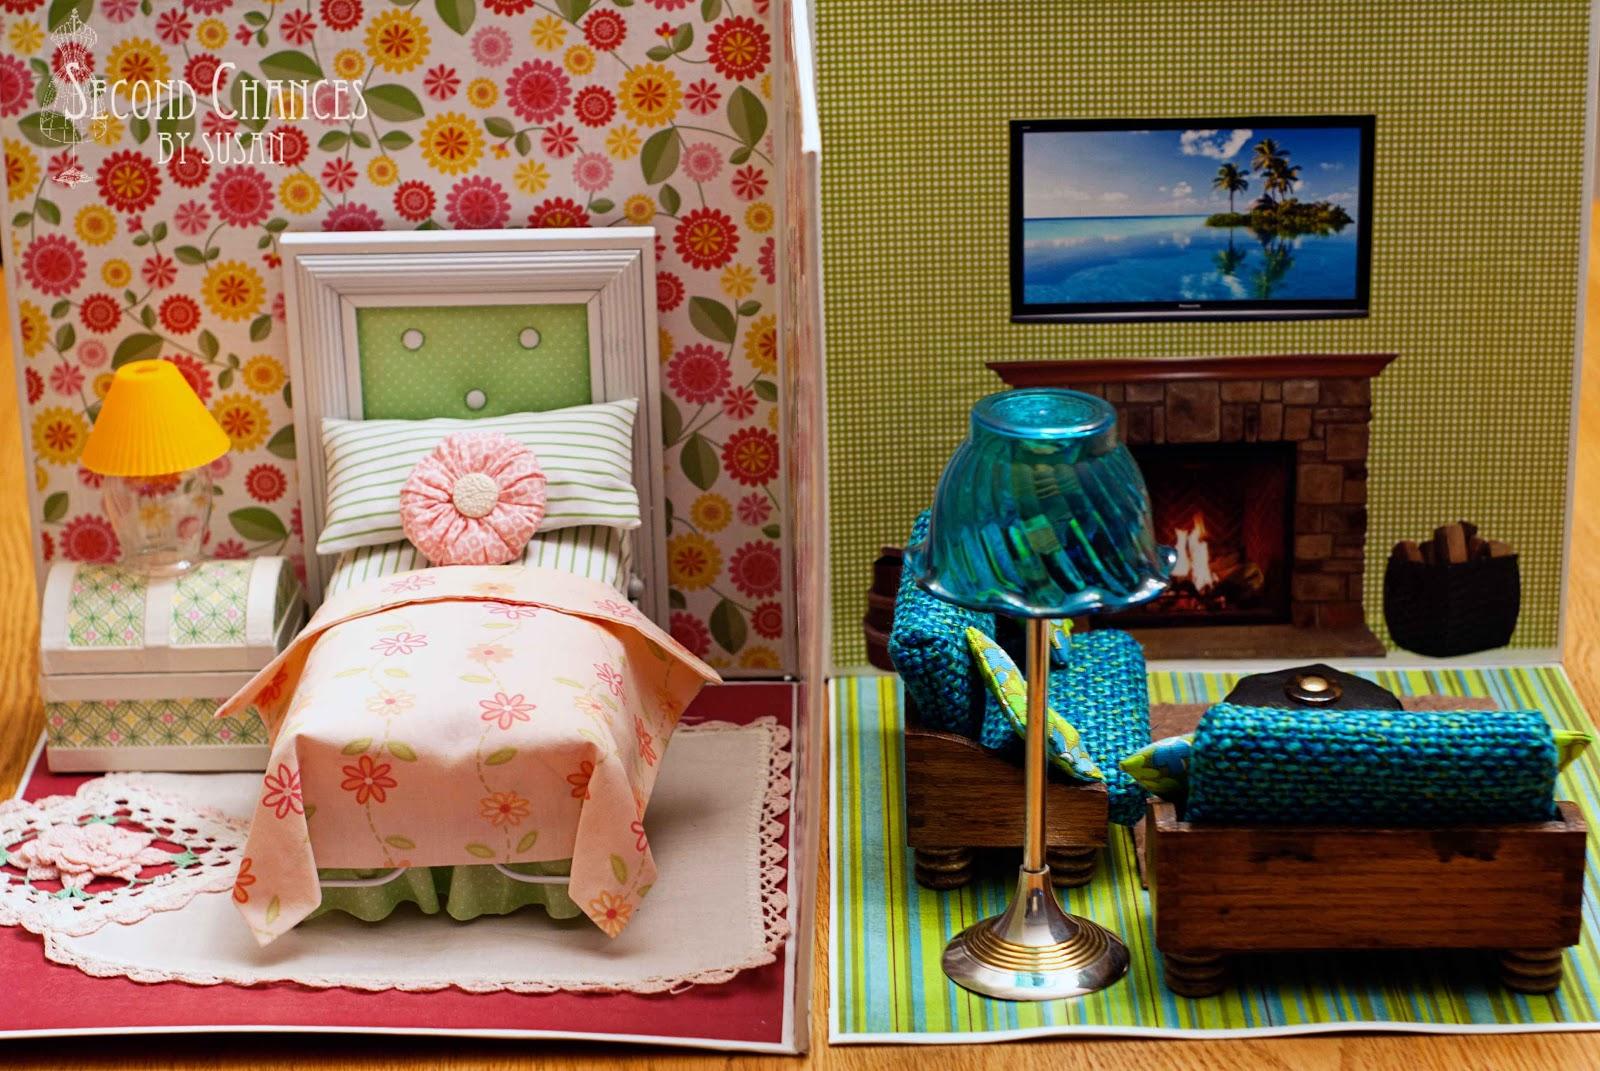 Miniature Dollhouse Bedroom Furniture Build Dollhouse Furniture Collapsible Second Chances Susan Blogger